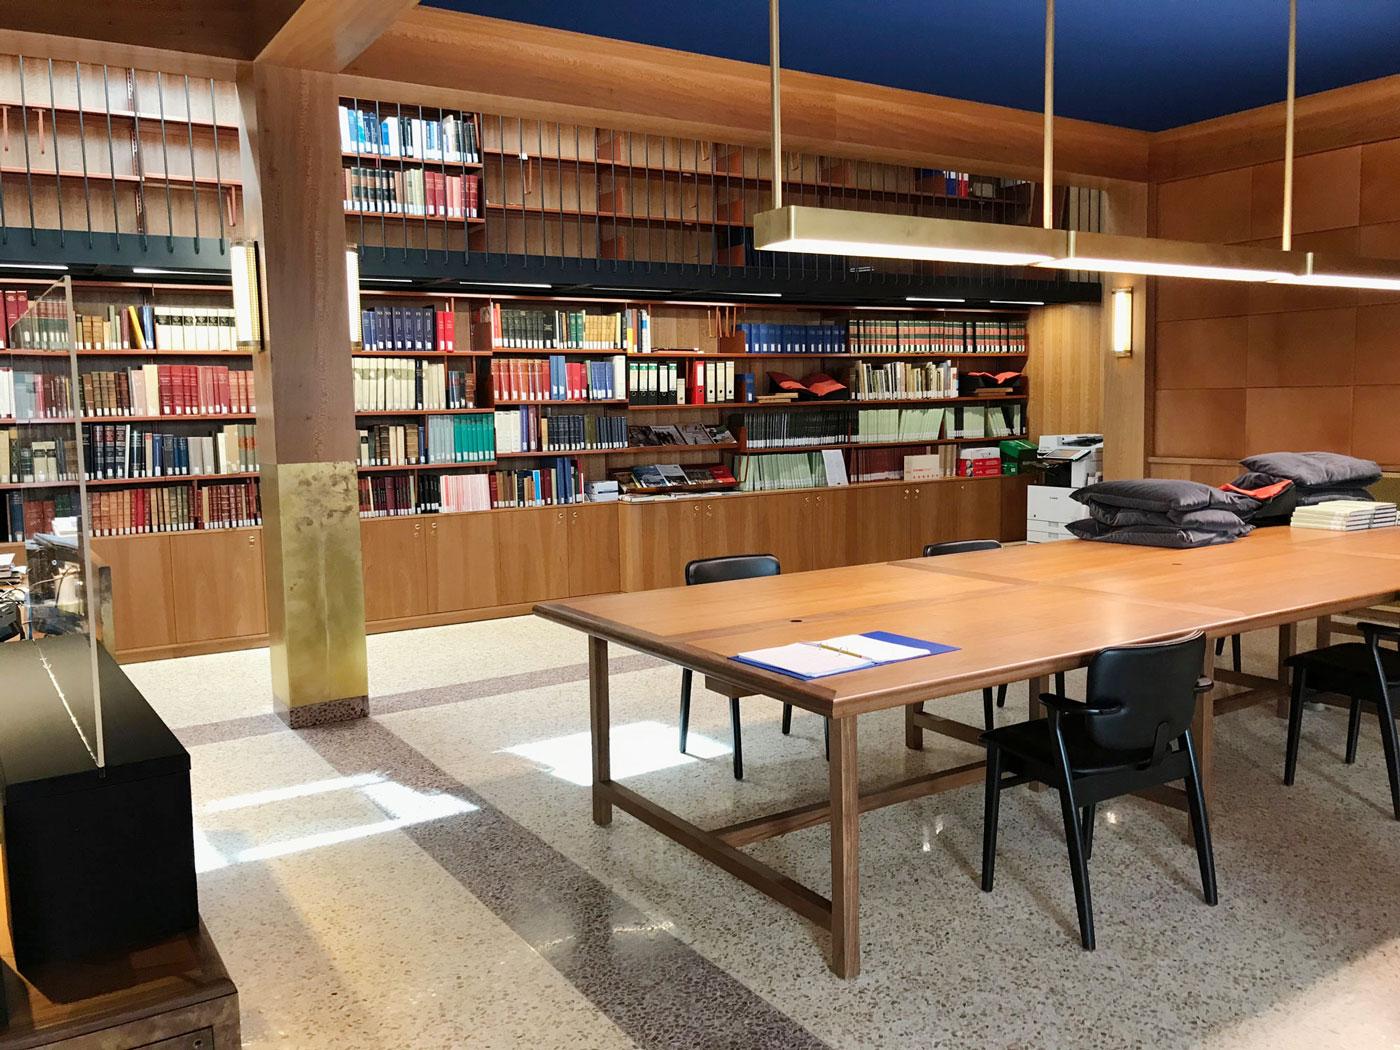 Leeszaal Museum Plantin-Moretus